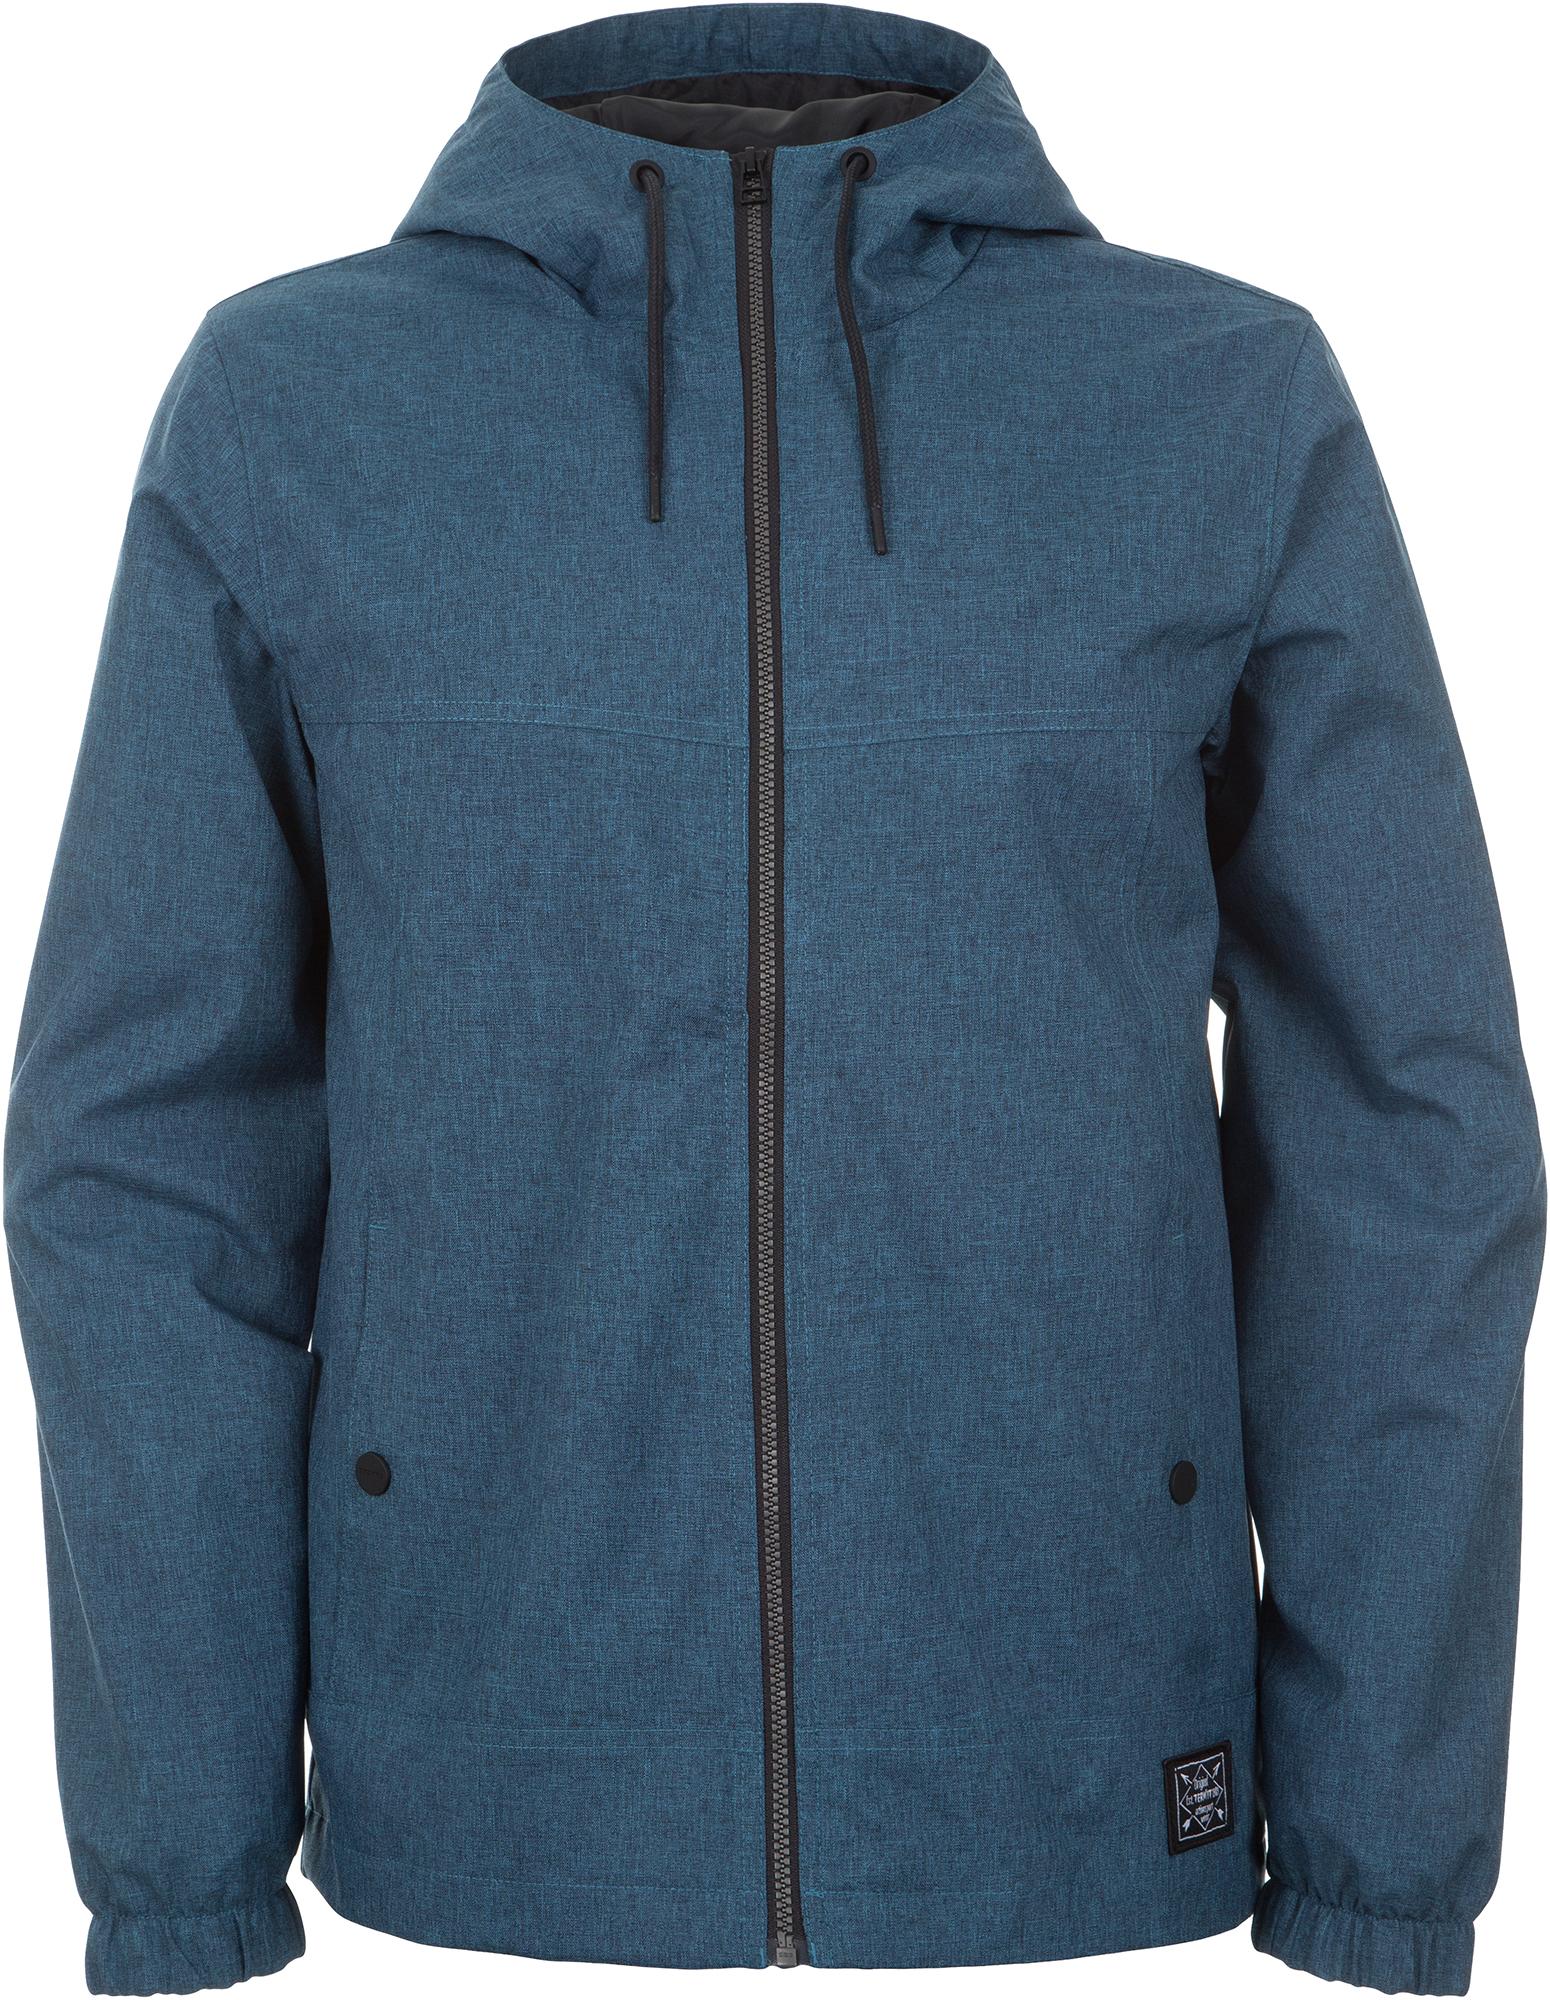 Termit Куртка мужская Termit, размер 54